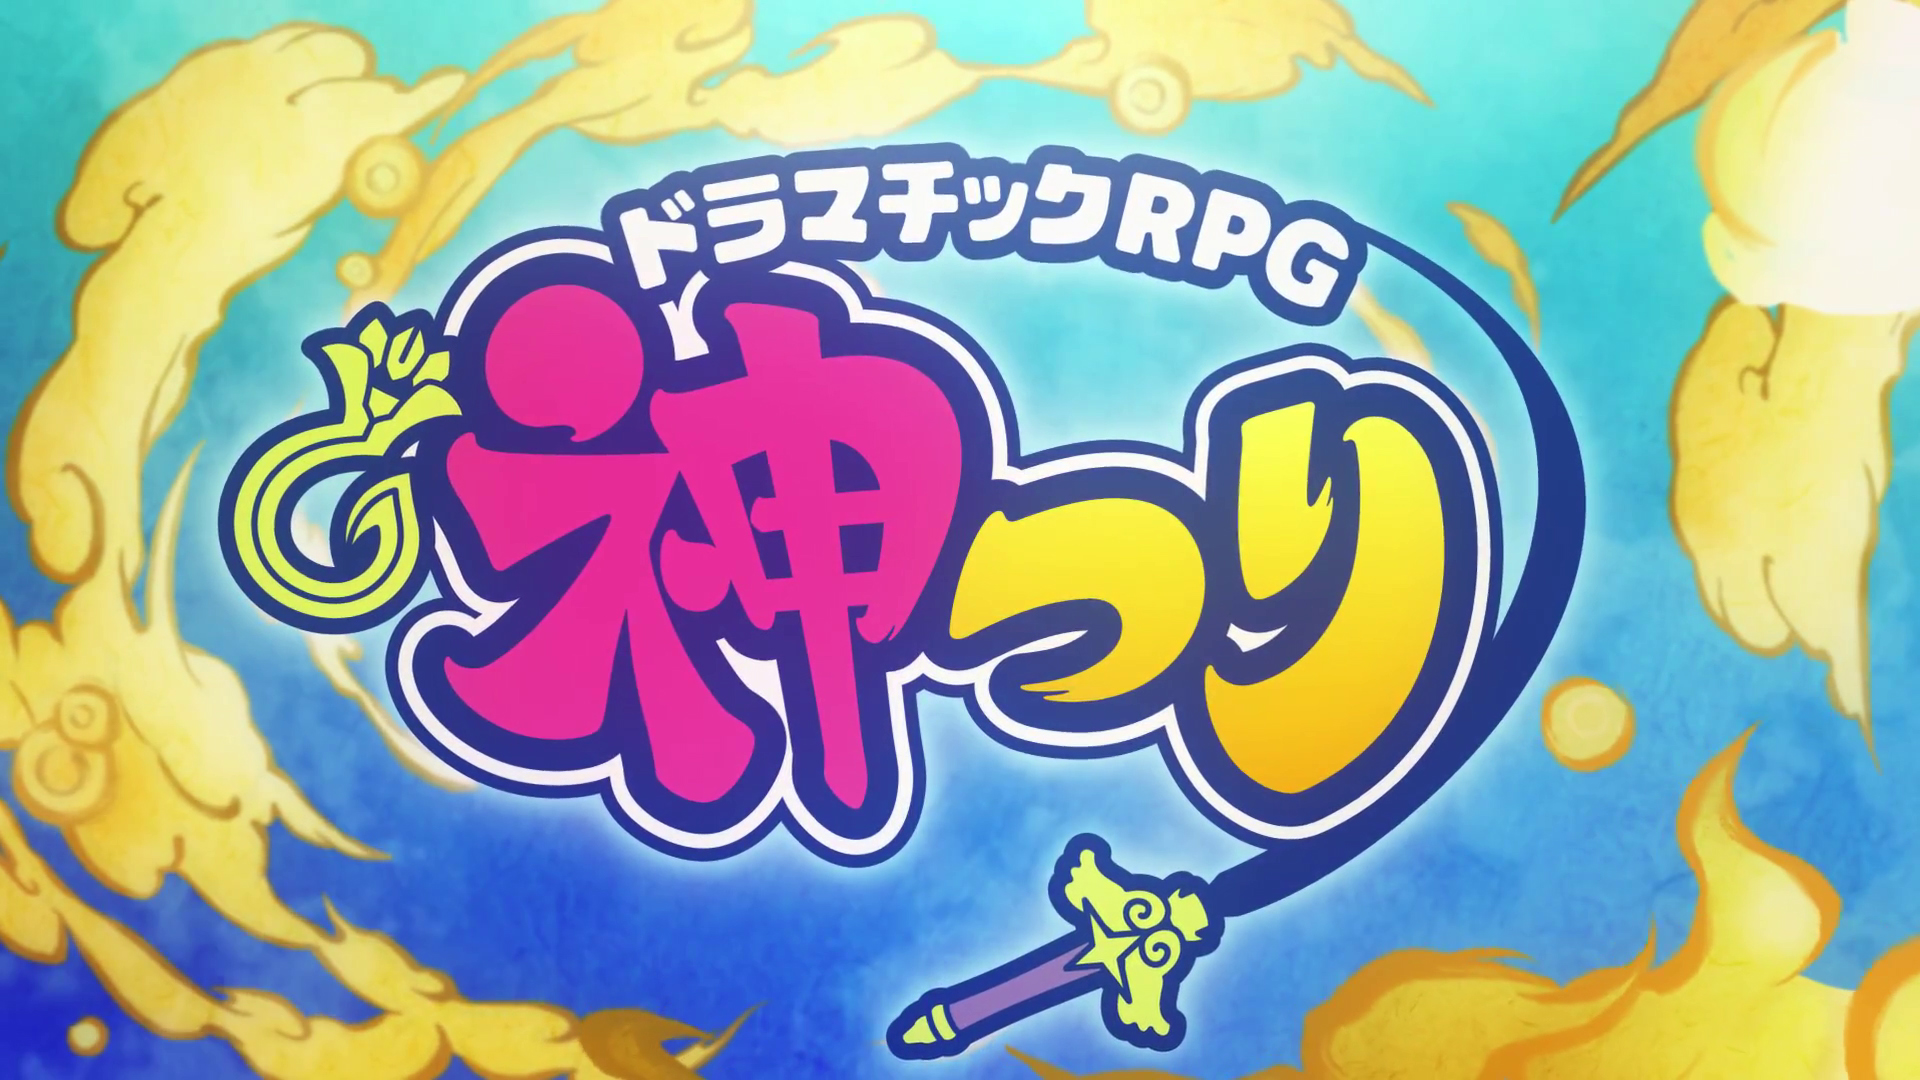 Square Enix announces 'Dramatic RPG Kamitsuri' for smartphones